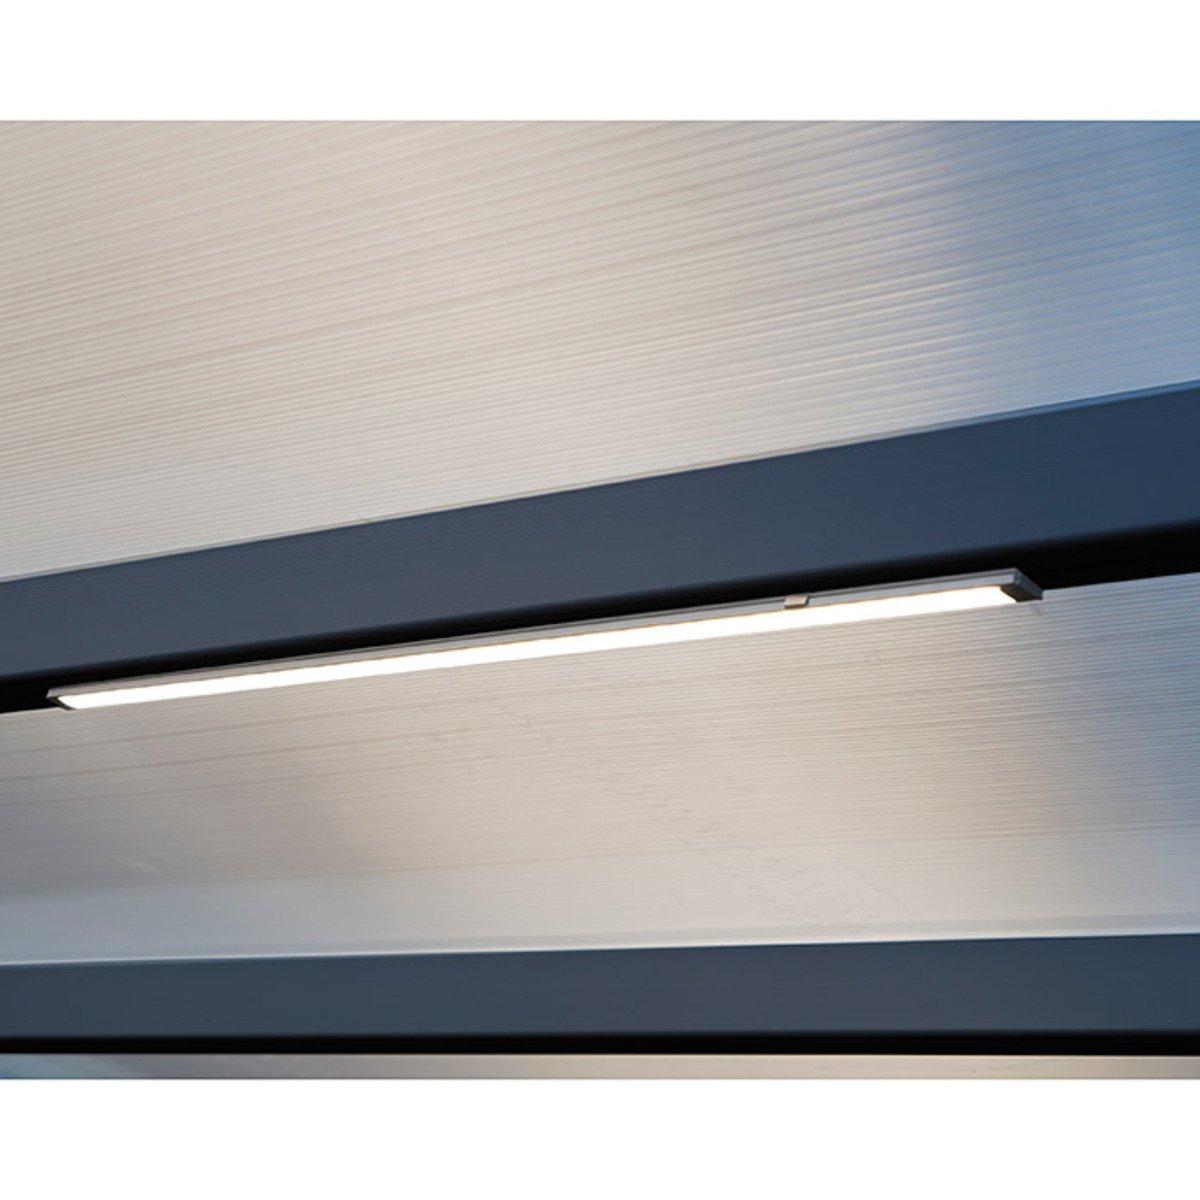 Bild 8 von Terrassenüberdachung Tuscany LED